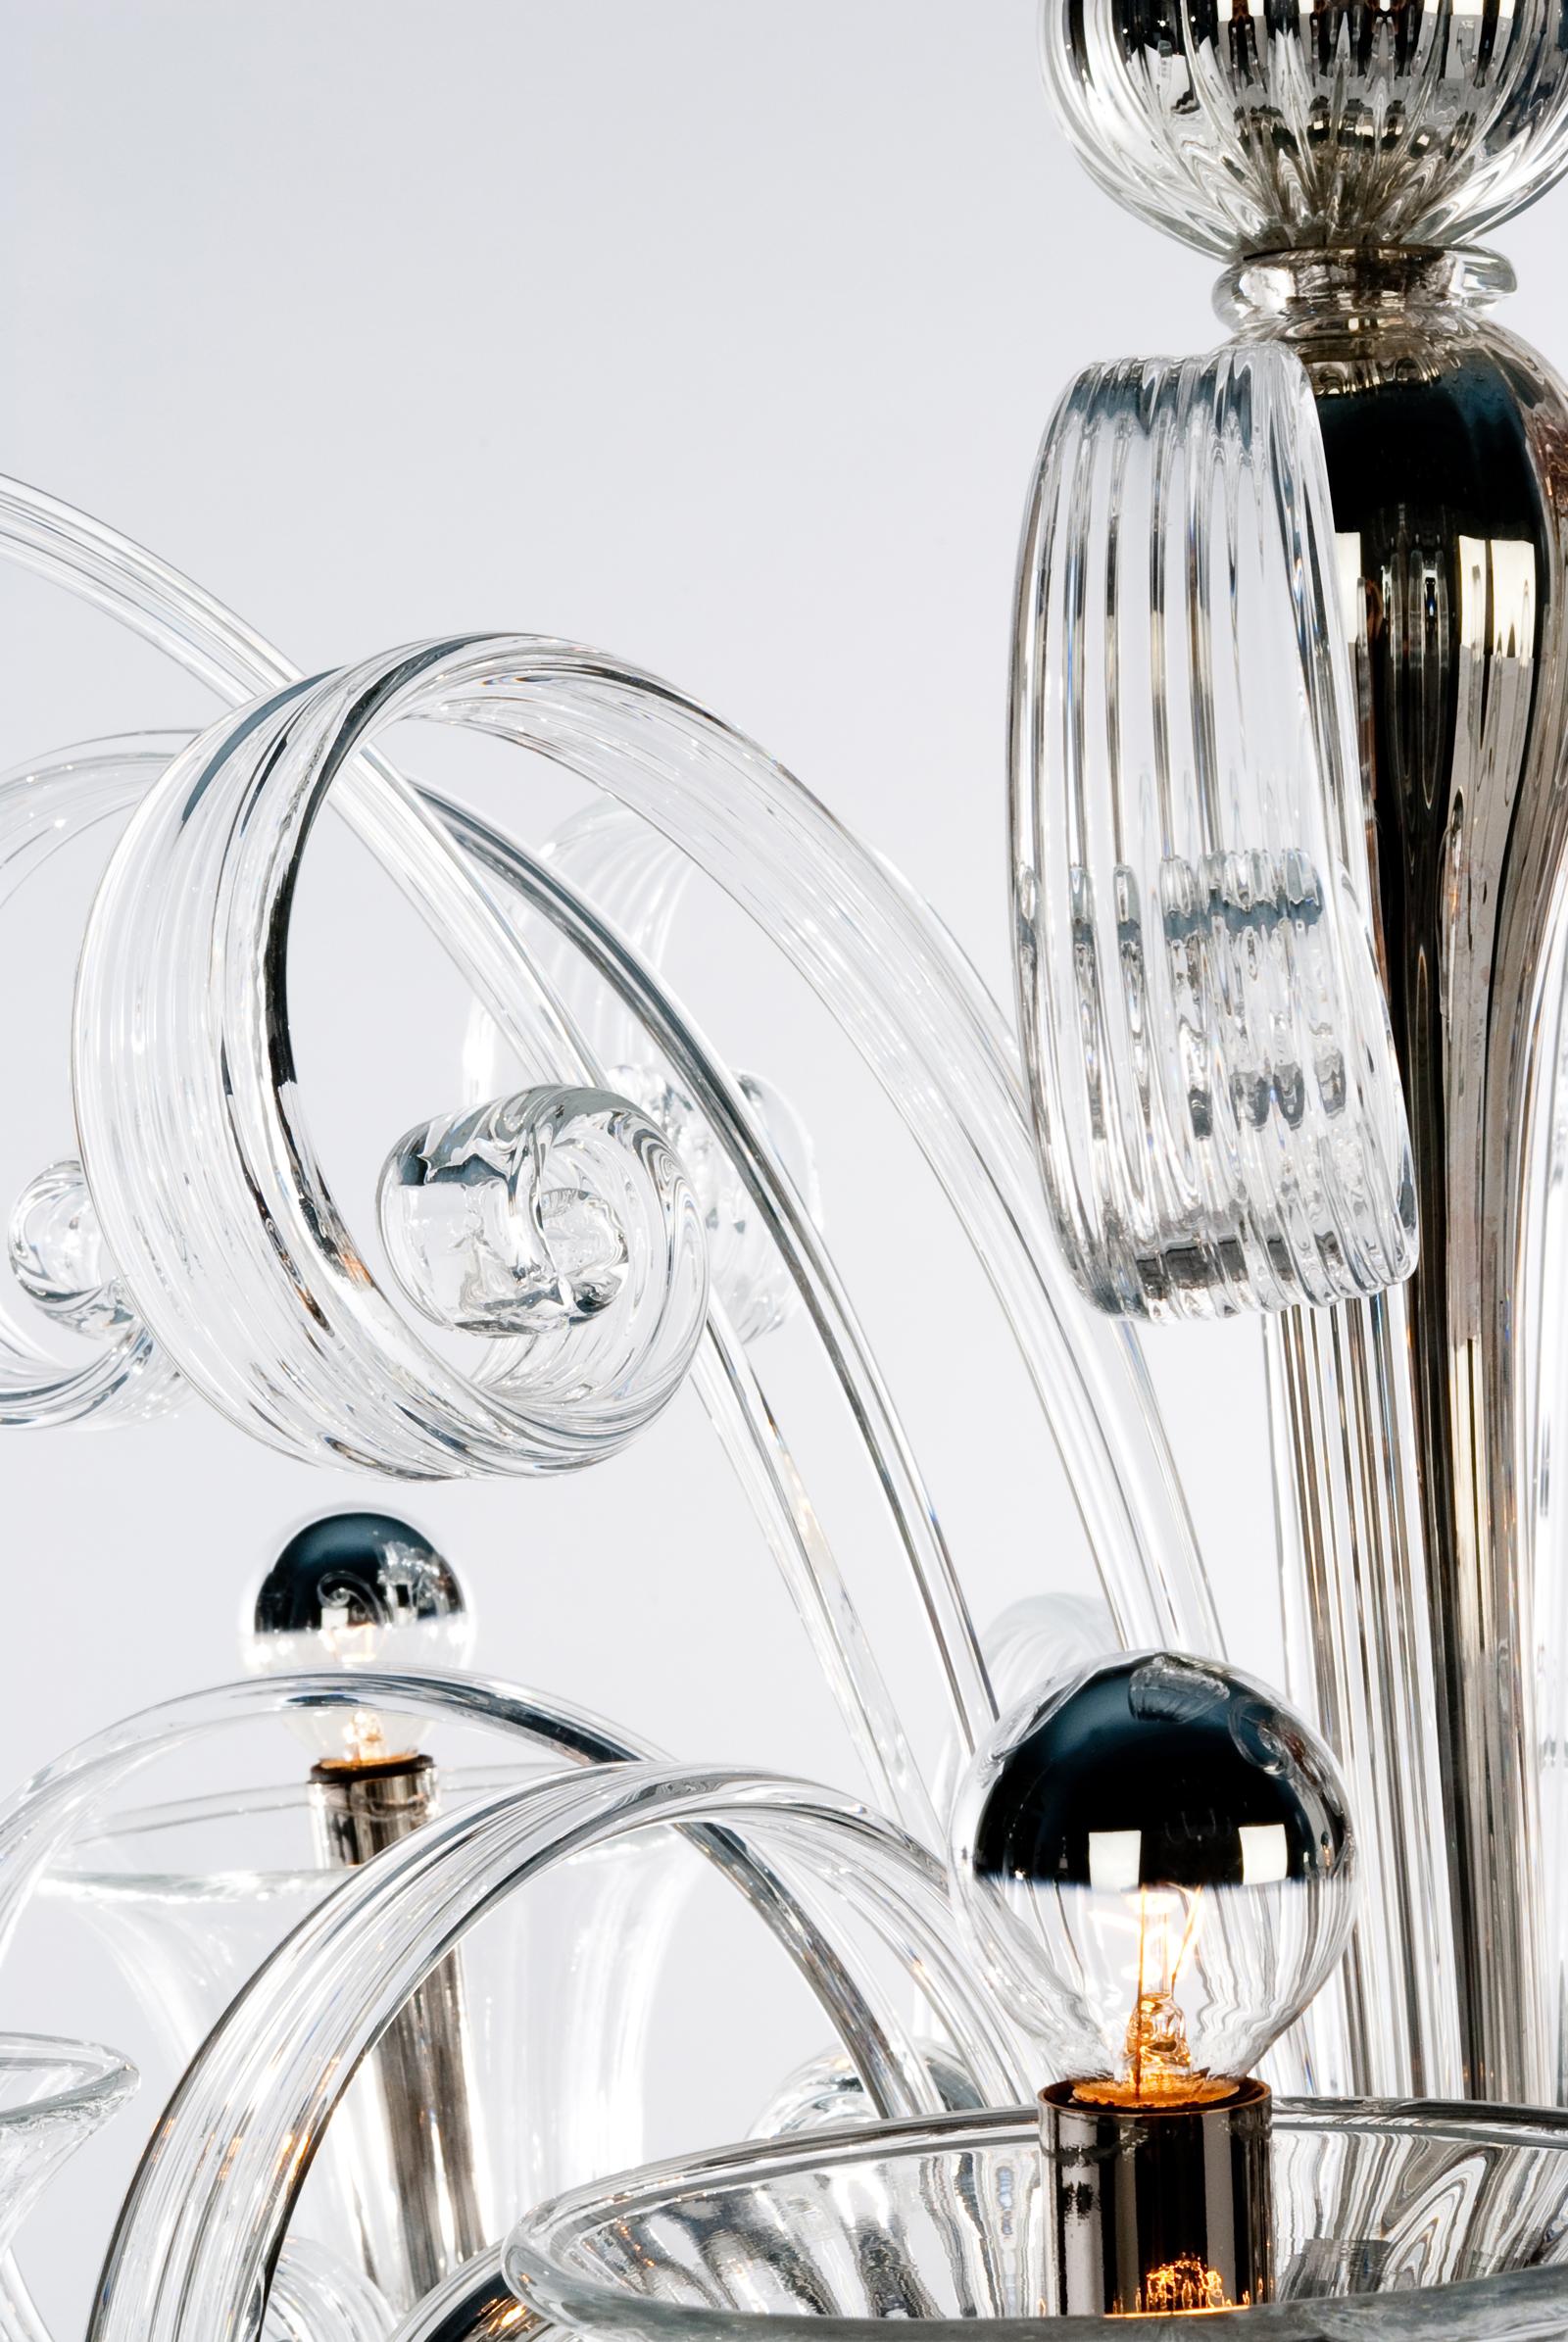 idole-floor-lamp-lampadaire-ute-wegener-didier-masquida-veronese-6.jpg